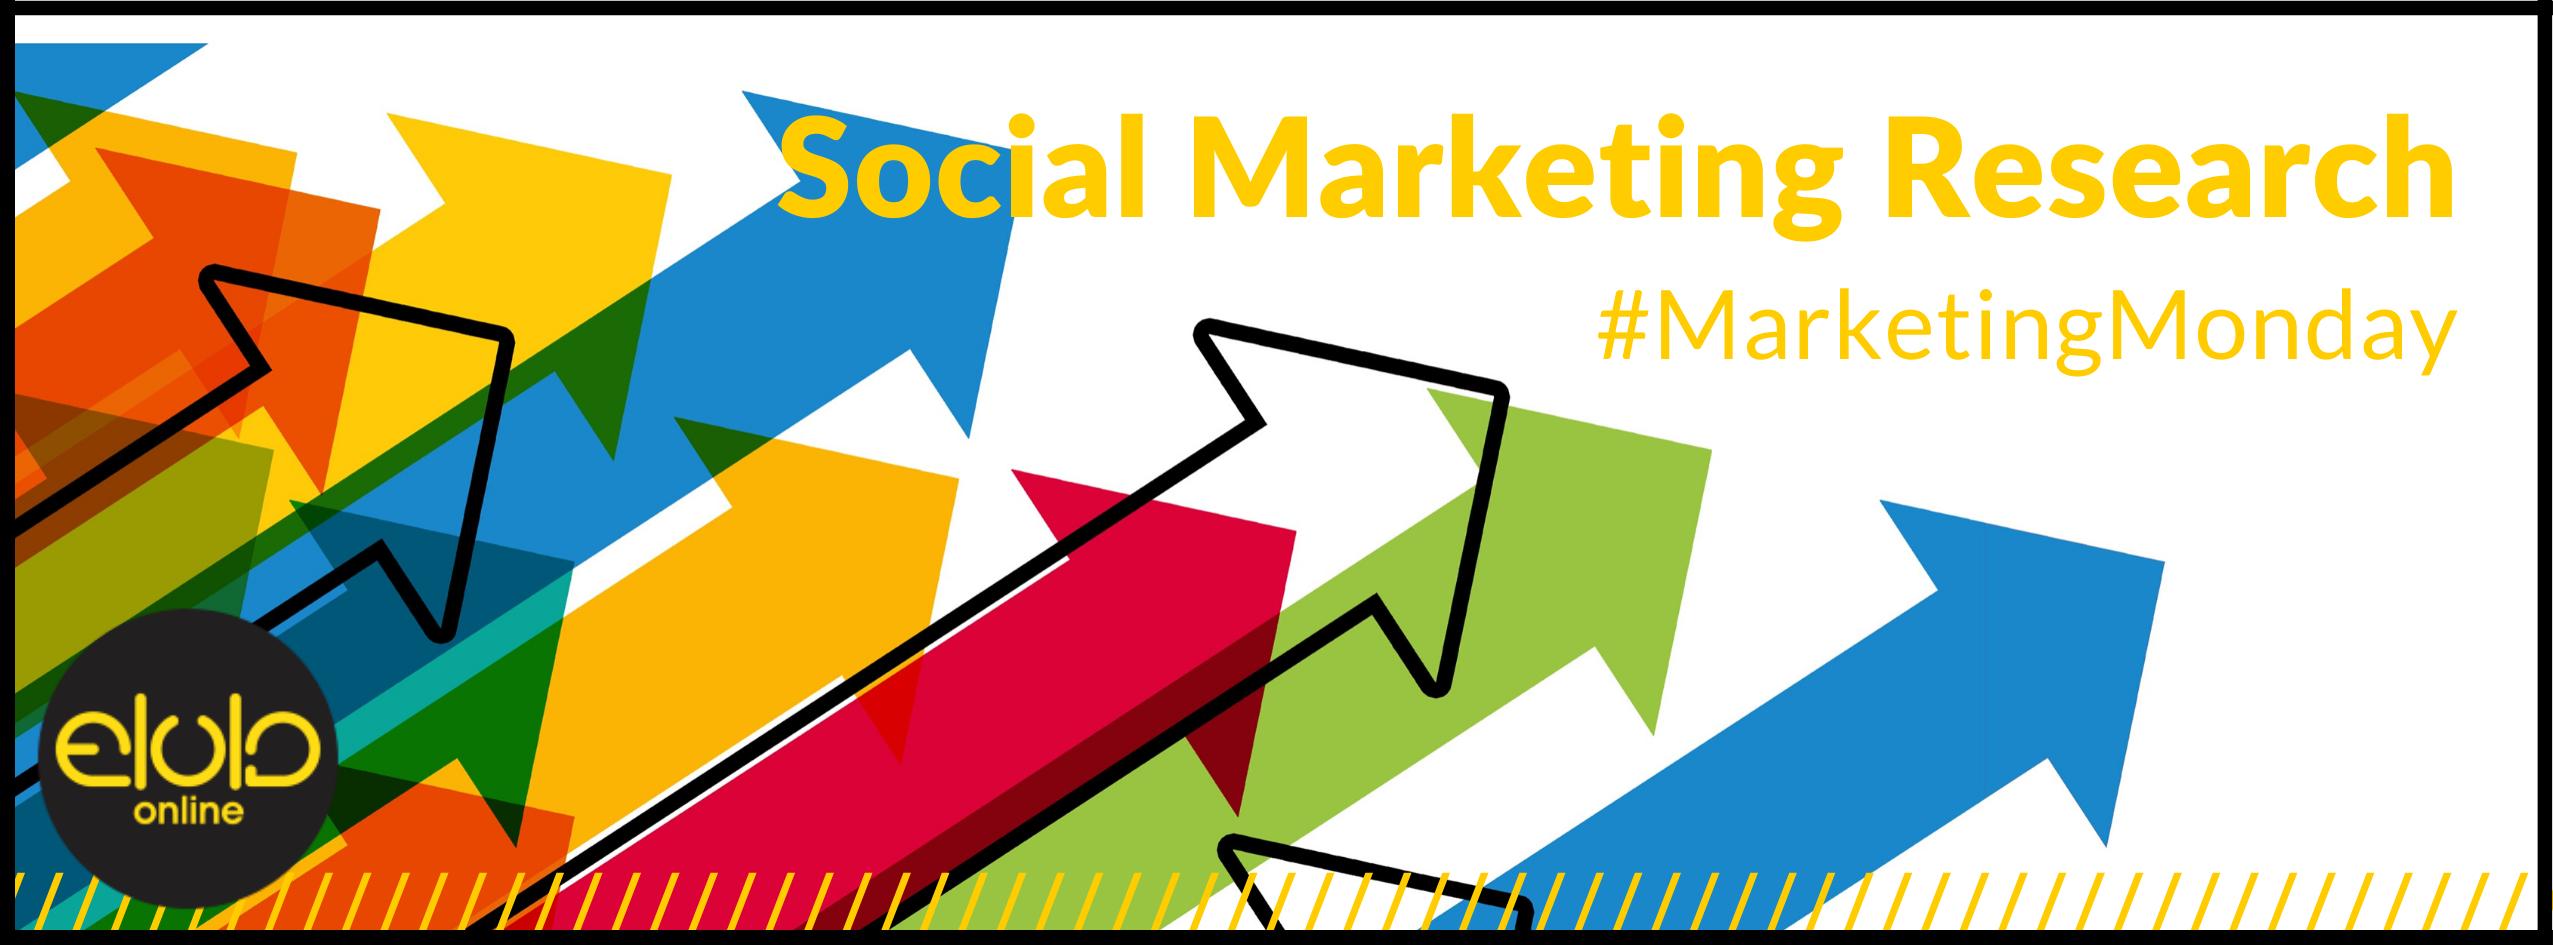 social marketing research, marketing research, marketing results, social sites, elula online, elula,